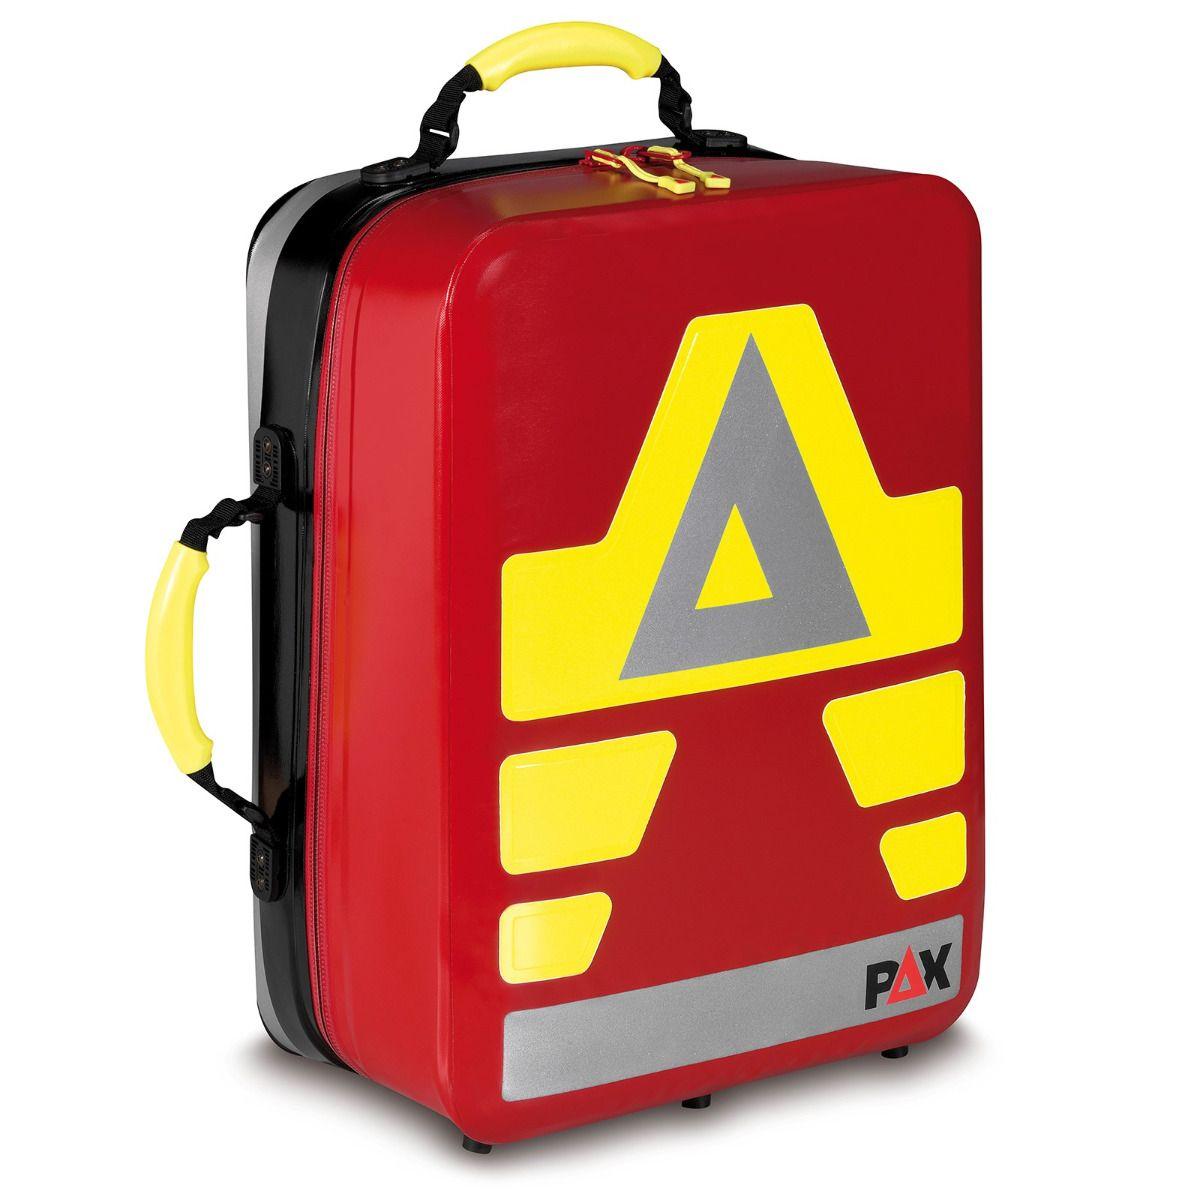 Notfallrucksack P5/11 L Wasserdicht Funktionsmodulset, PAX-Tec in rot